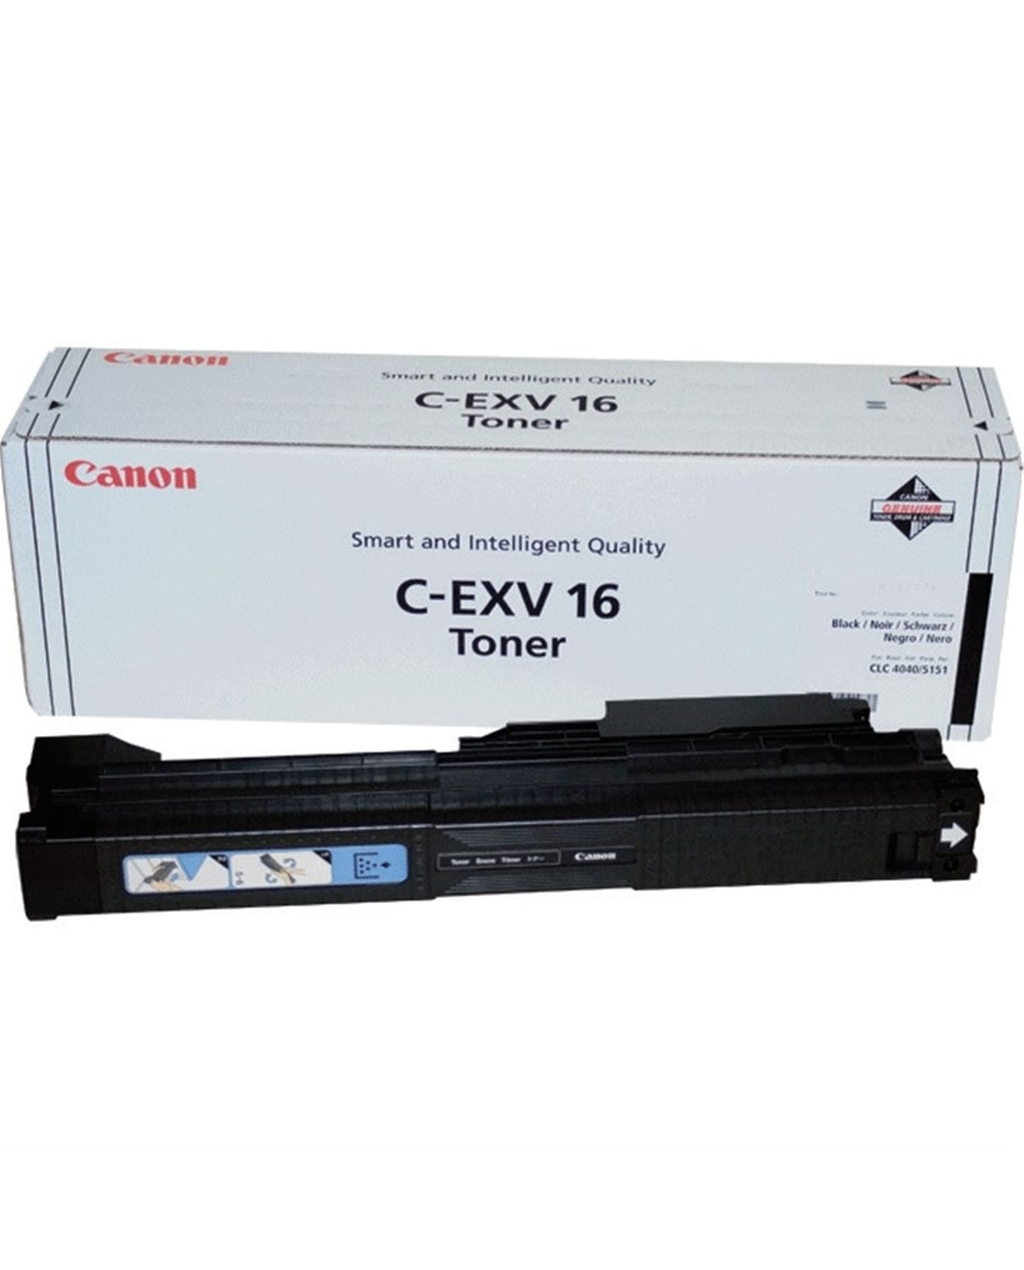 707BK - Canon Lbp5000 Toner   - Black